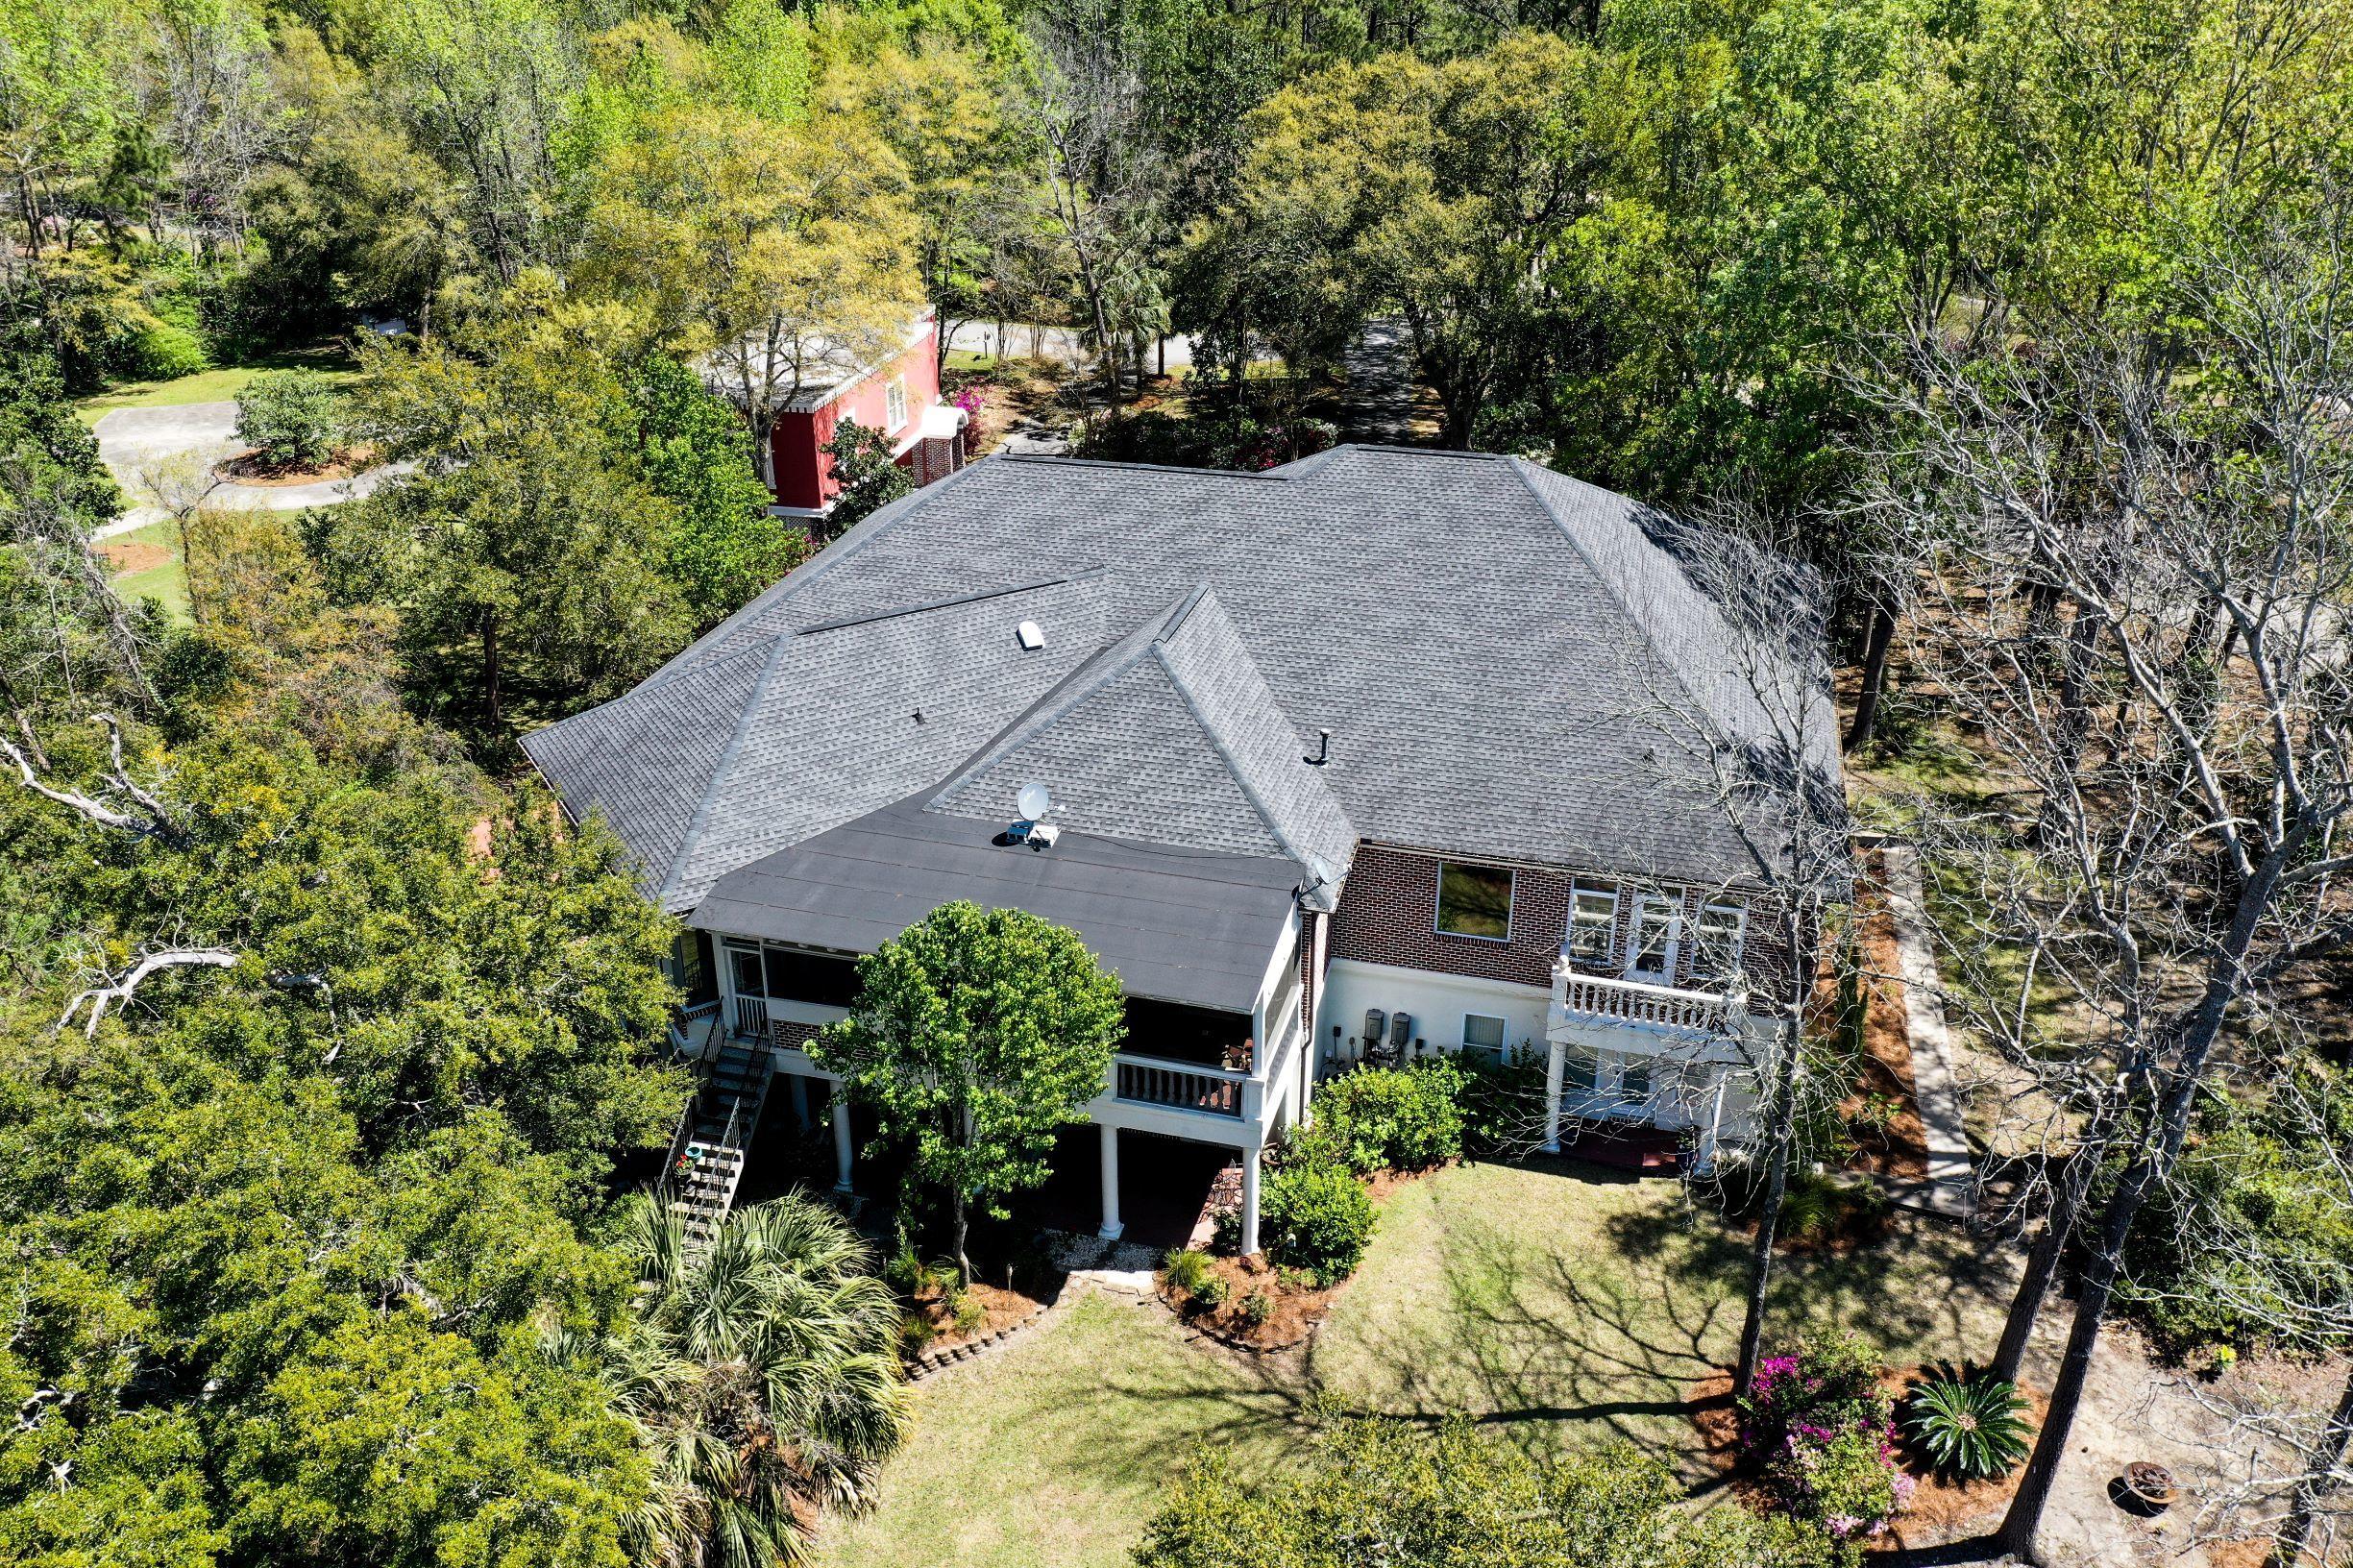 Cainhoy Landing Homes For Sale - 112 Cainhoy Landing, Charleston, SC - 82